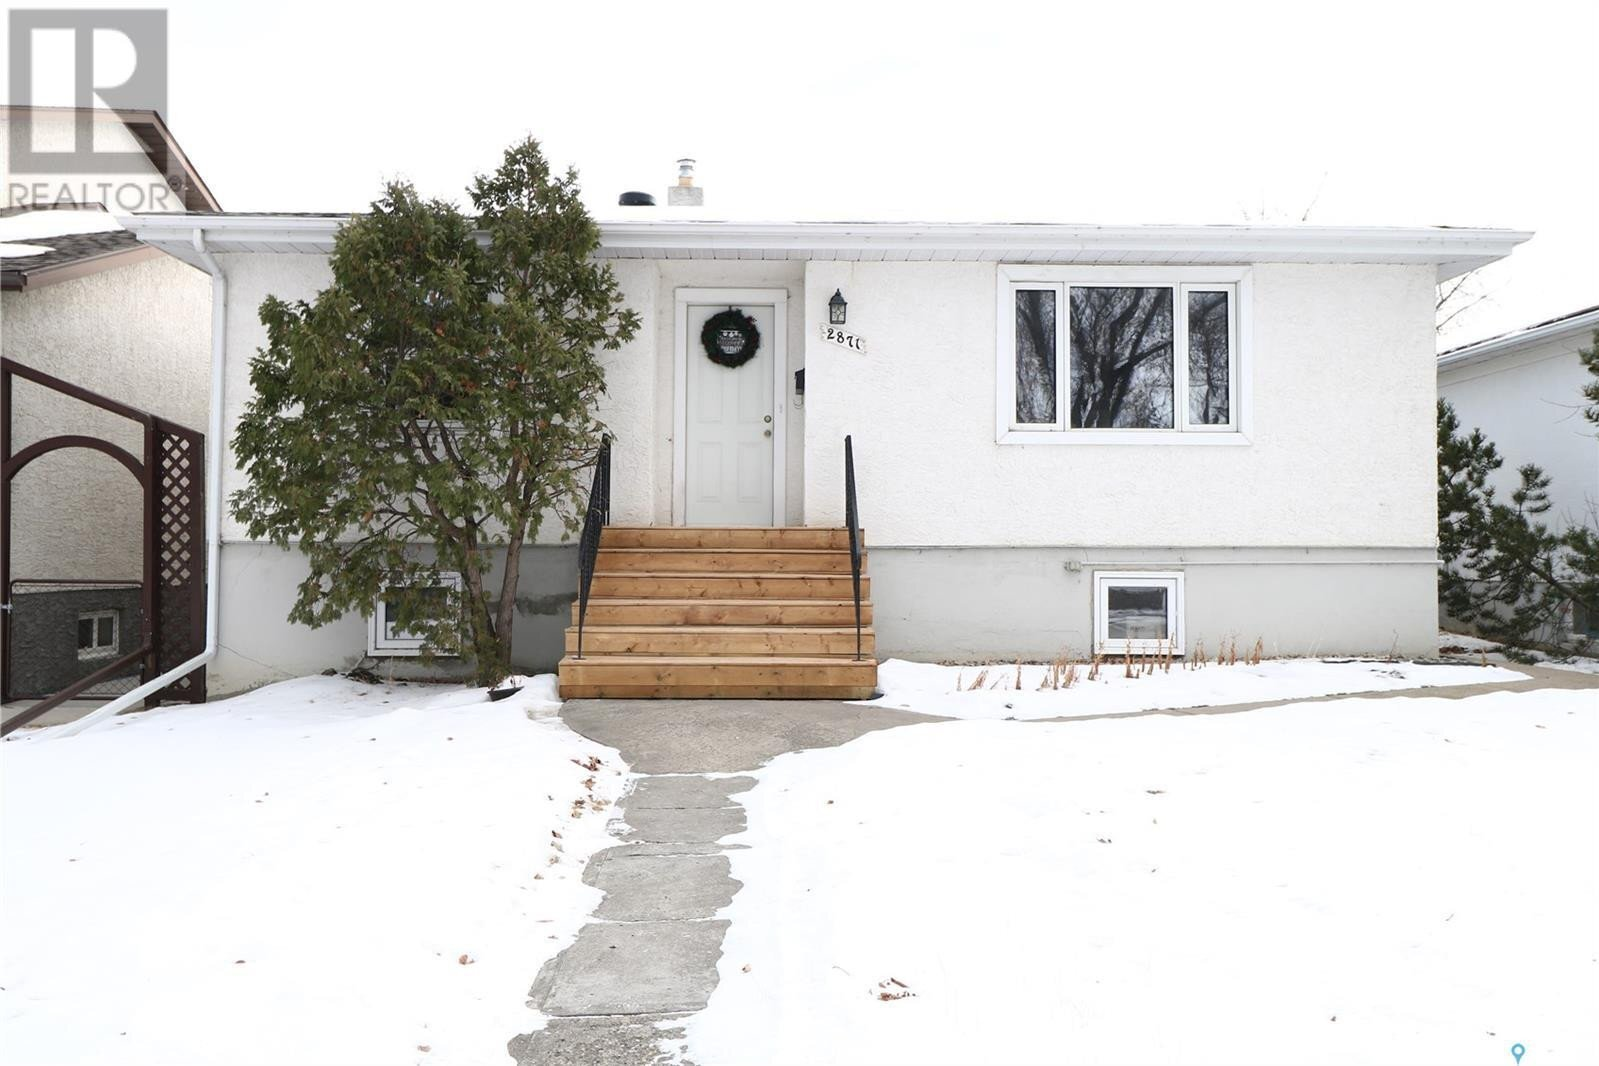 House for sale at 2871 Athol St Regina Saskatchewan - MLS: SK836173